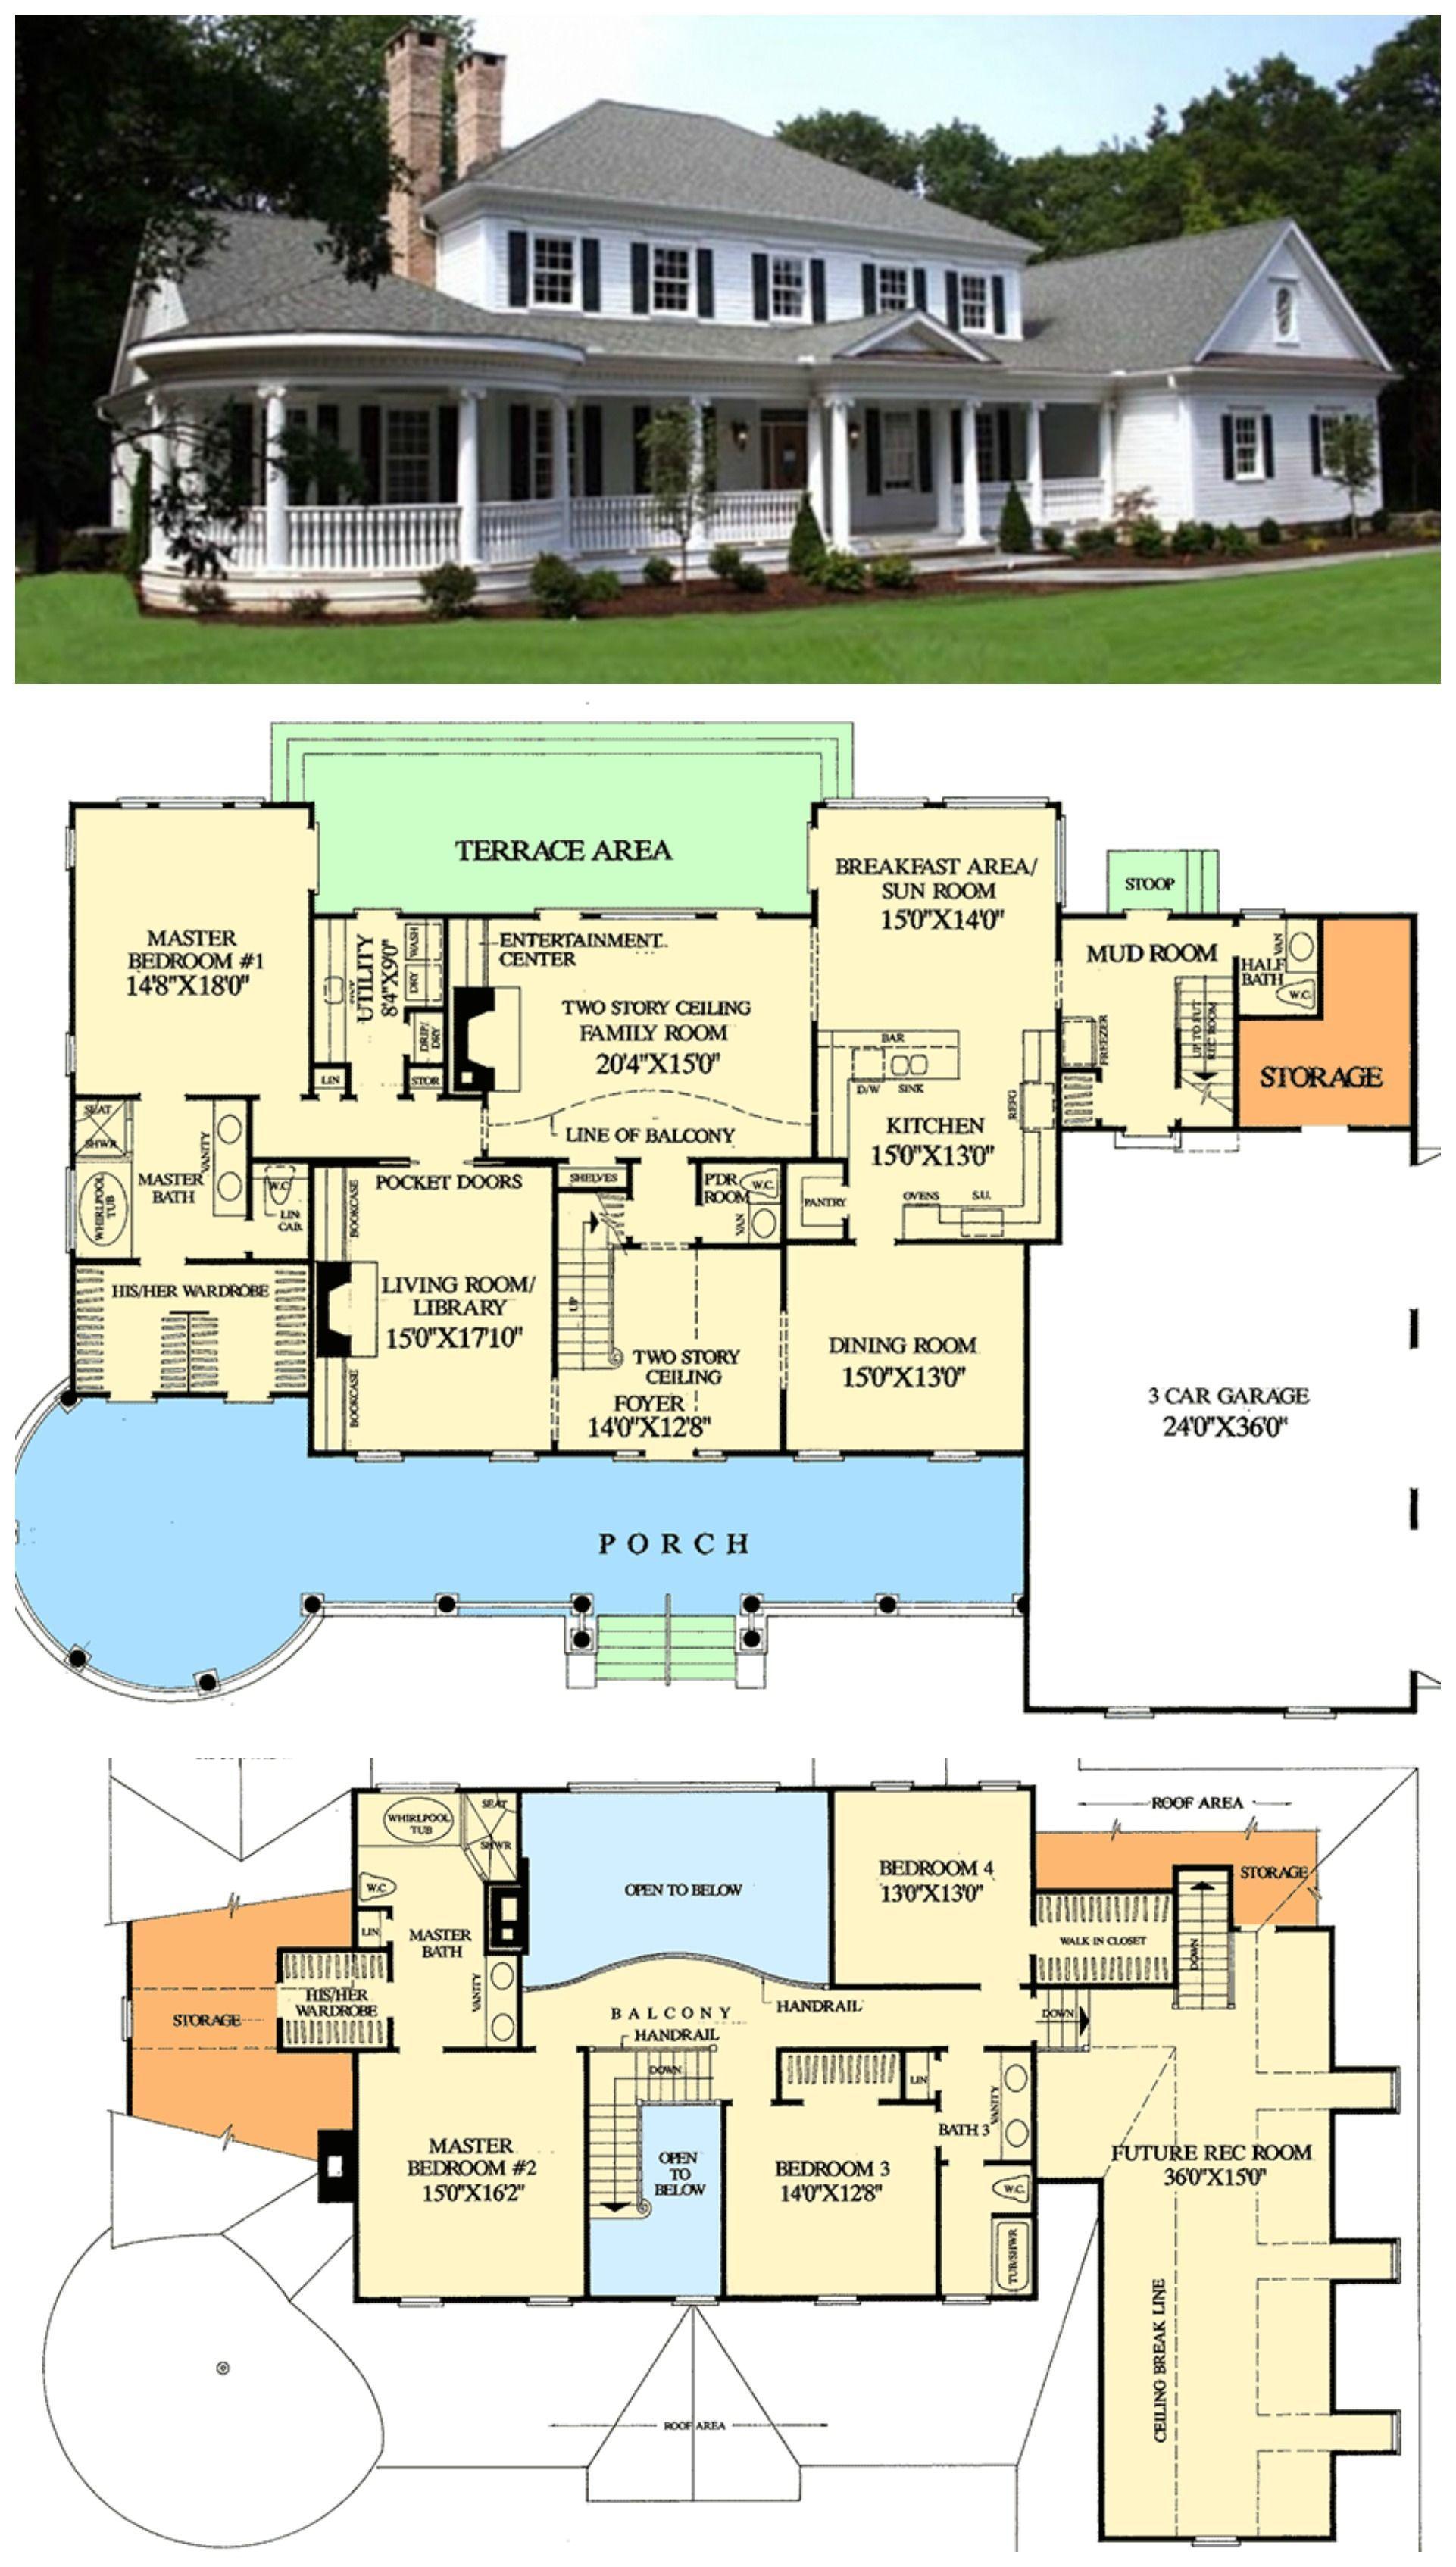 Mab Farmhouse Floor Plans House Blueprints Dream House Plans